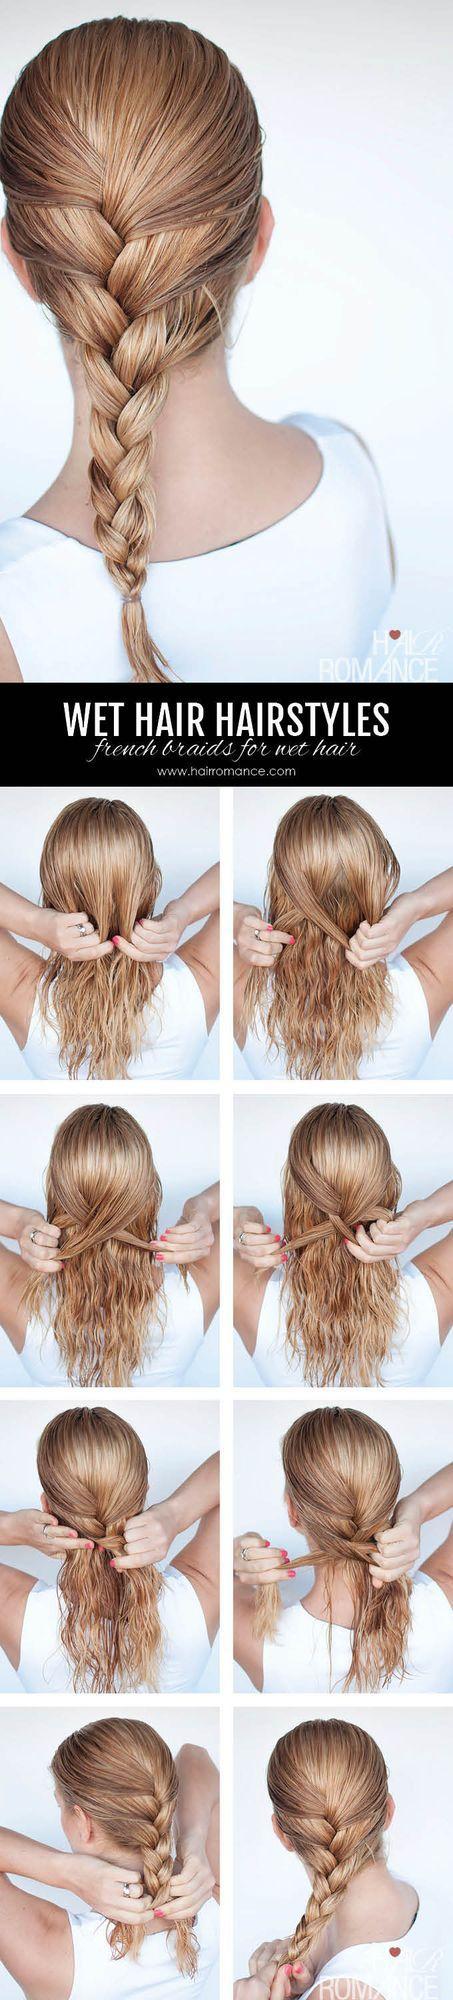 Sensational 1000 Ideas About Wet Hair Hairstyles On Pinterest Wet Short Hairstyles For Black Women Fulllsitofus